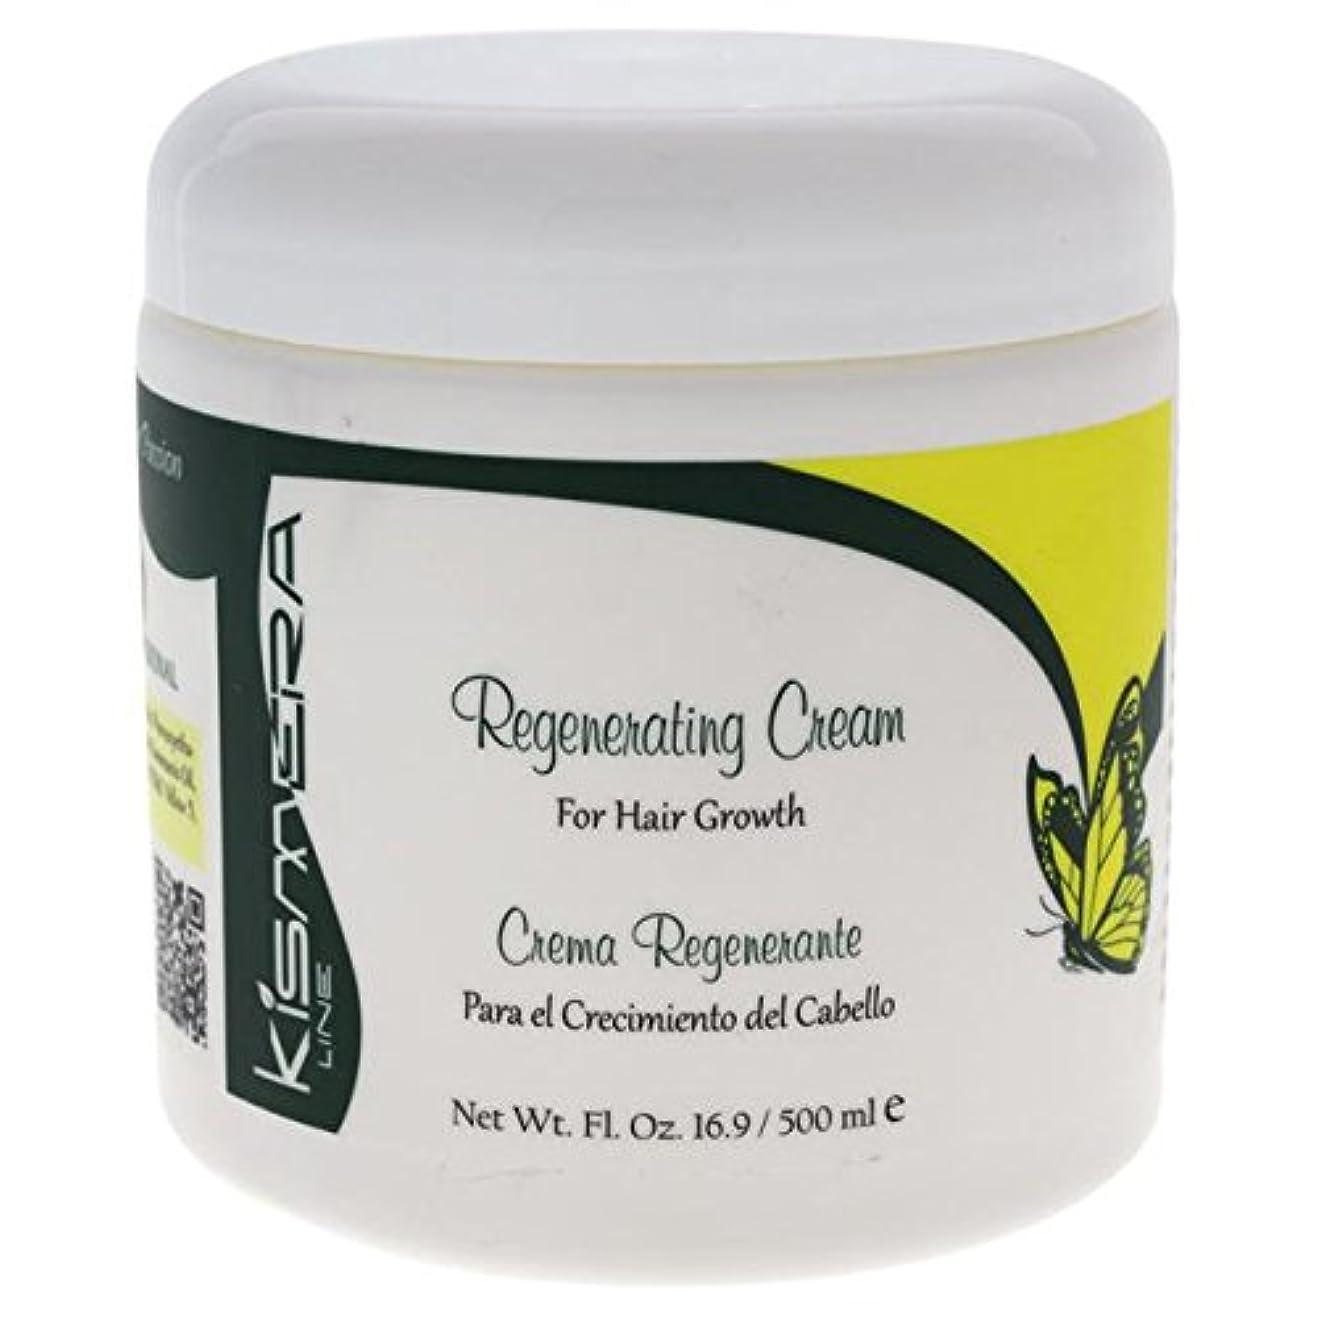 Kismera Regenerating Cream for Hair Growth 16.9oz by KUZ